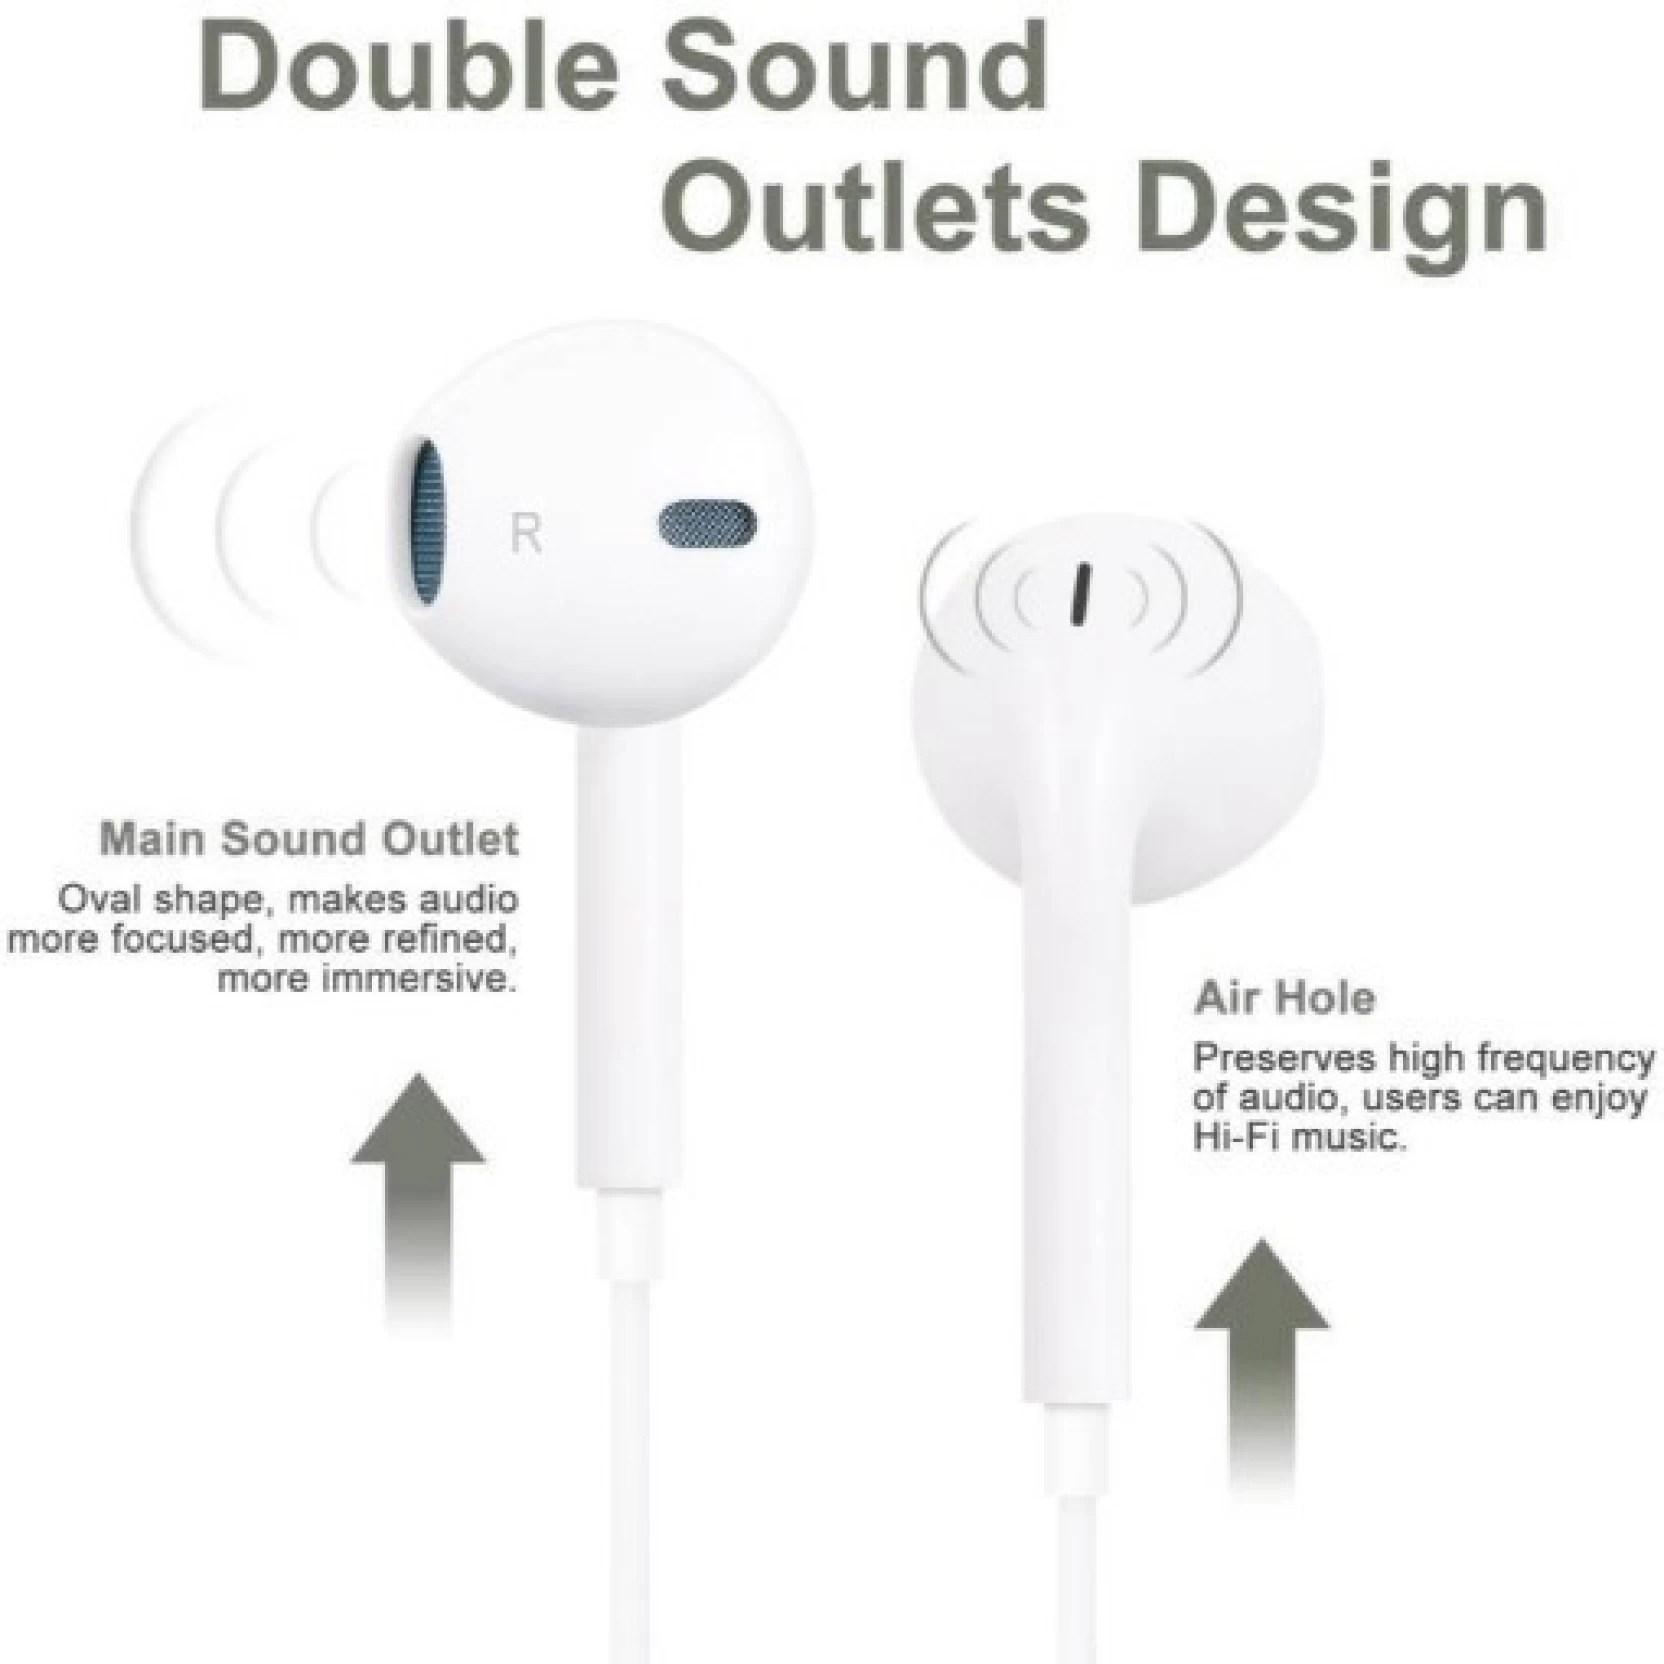 medium resolution of clairbell omx 573o apple oppo wired headphone wired headphone wired headphone wired stereo headphone wired headphone gym headphone sports